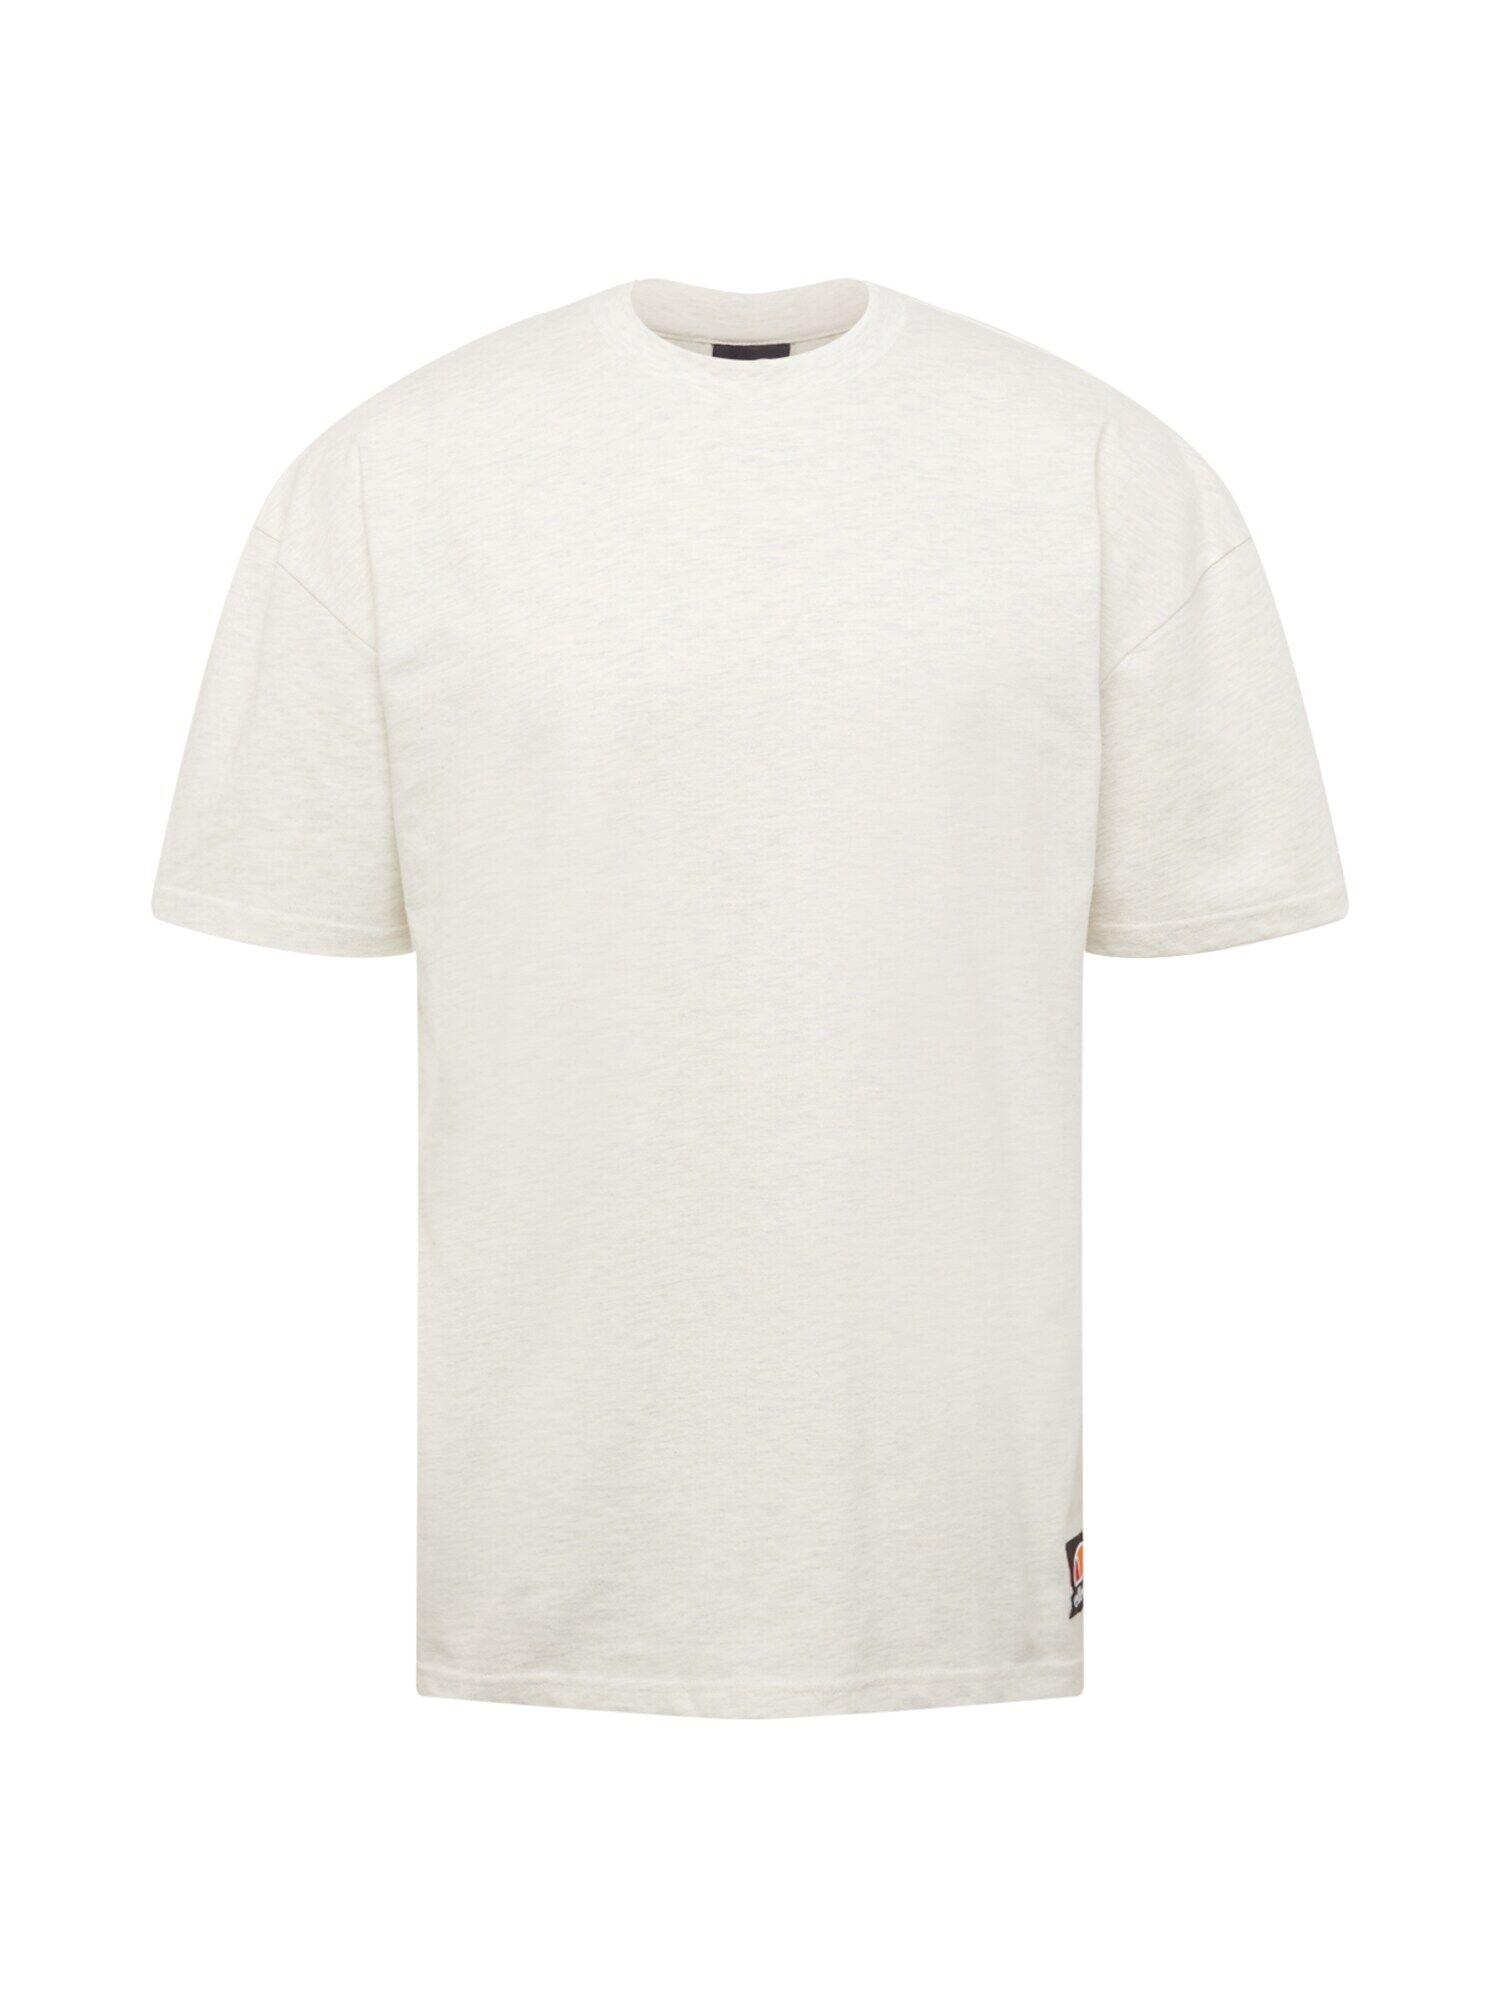 ELLESSE T-Shirt 'Avis'  - Blanc - Taille: XXL - male